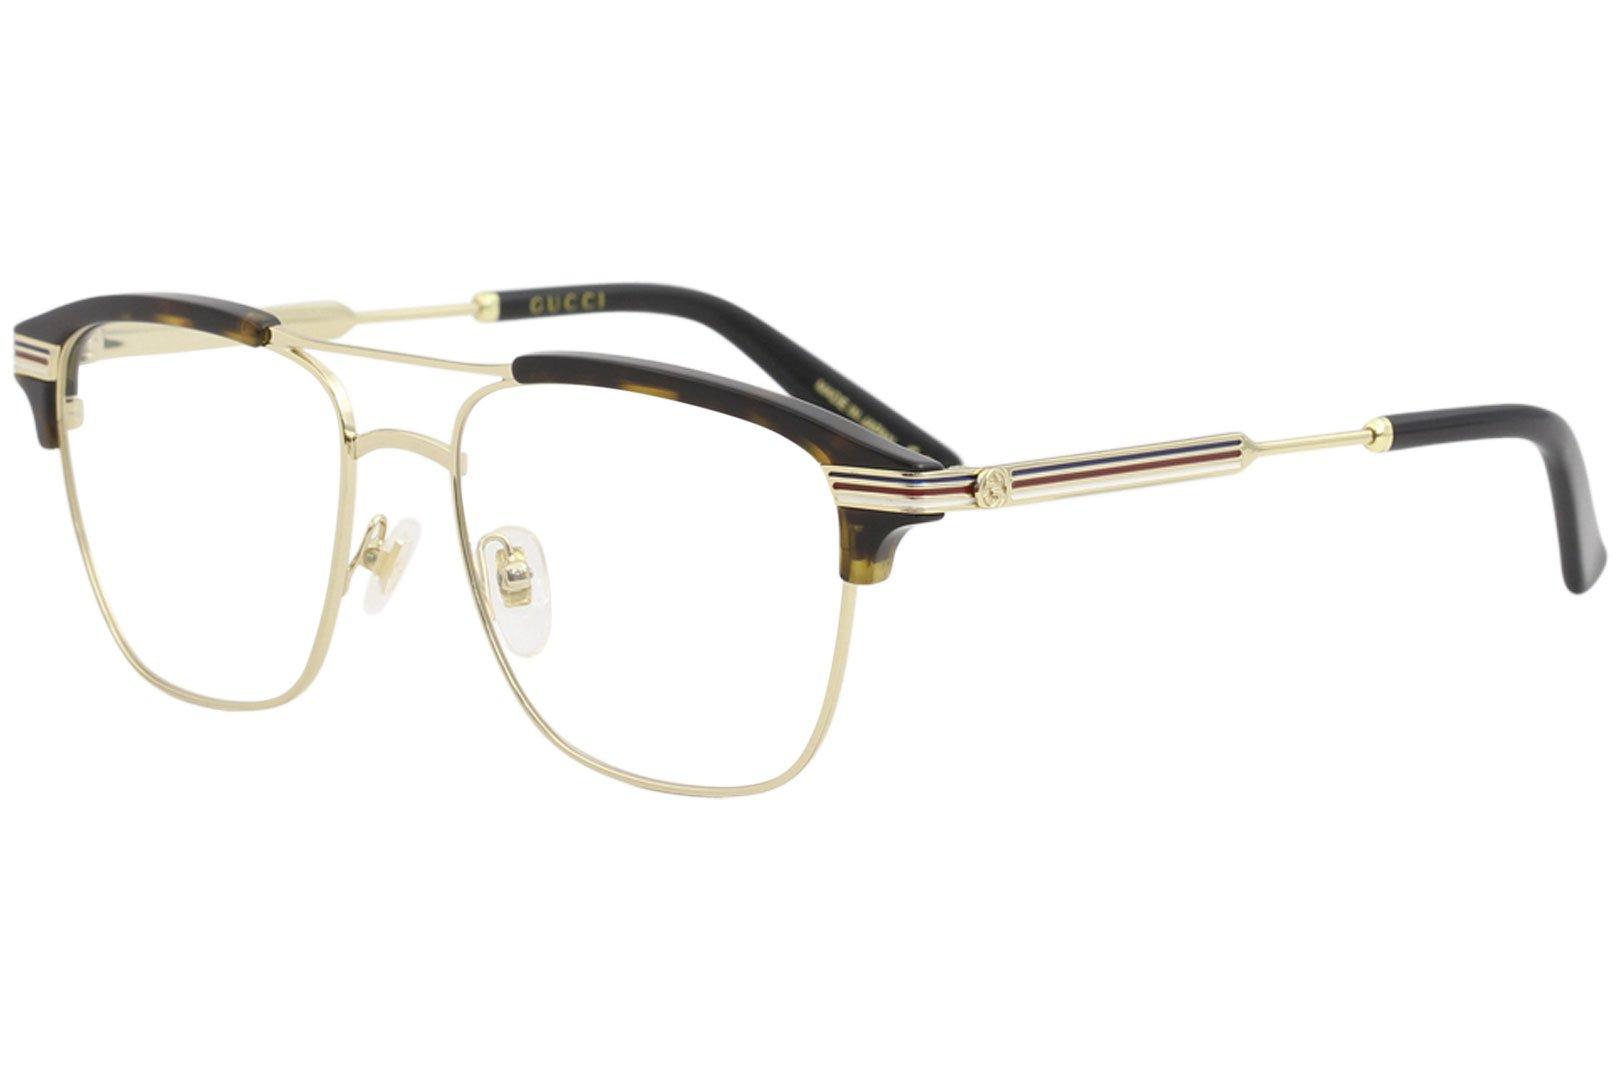 Gucci GG 0241O 003 Gold Havana Plastic Rectangle Eyeglasses 54mm